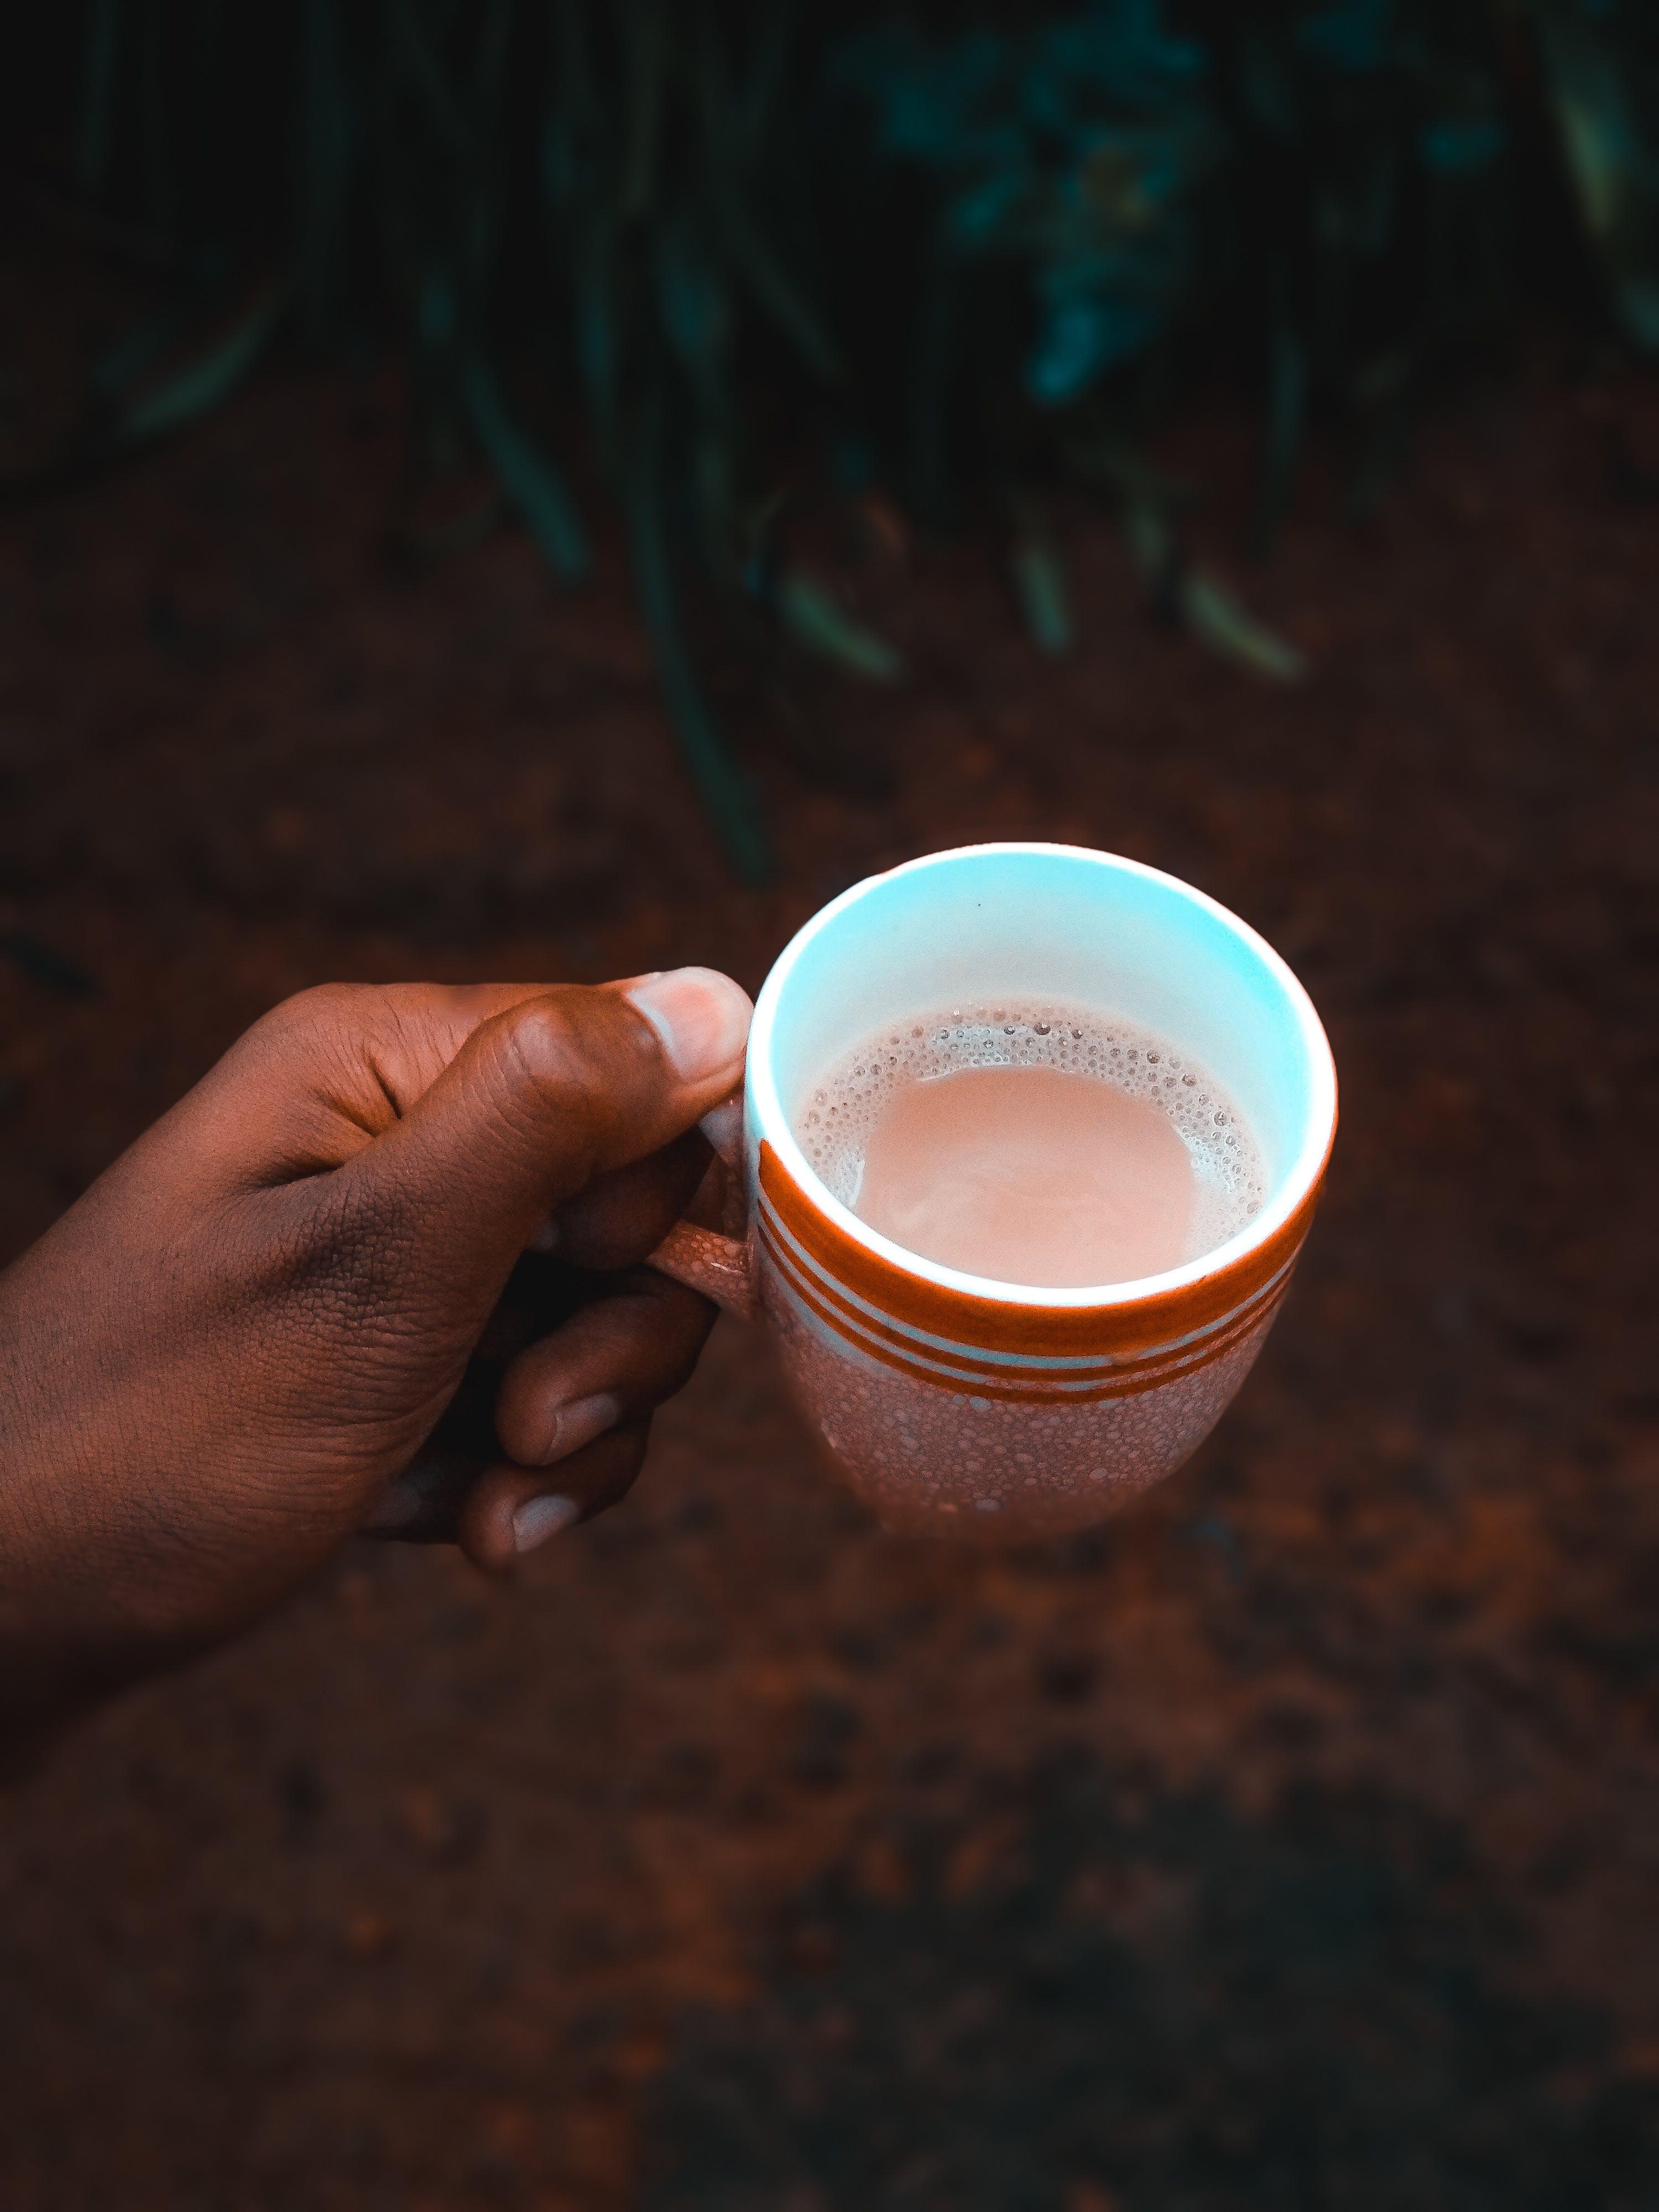 Kostenloses Stock Foto zu cappuccino, espresso, fokus, getränk